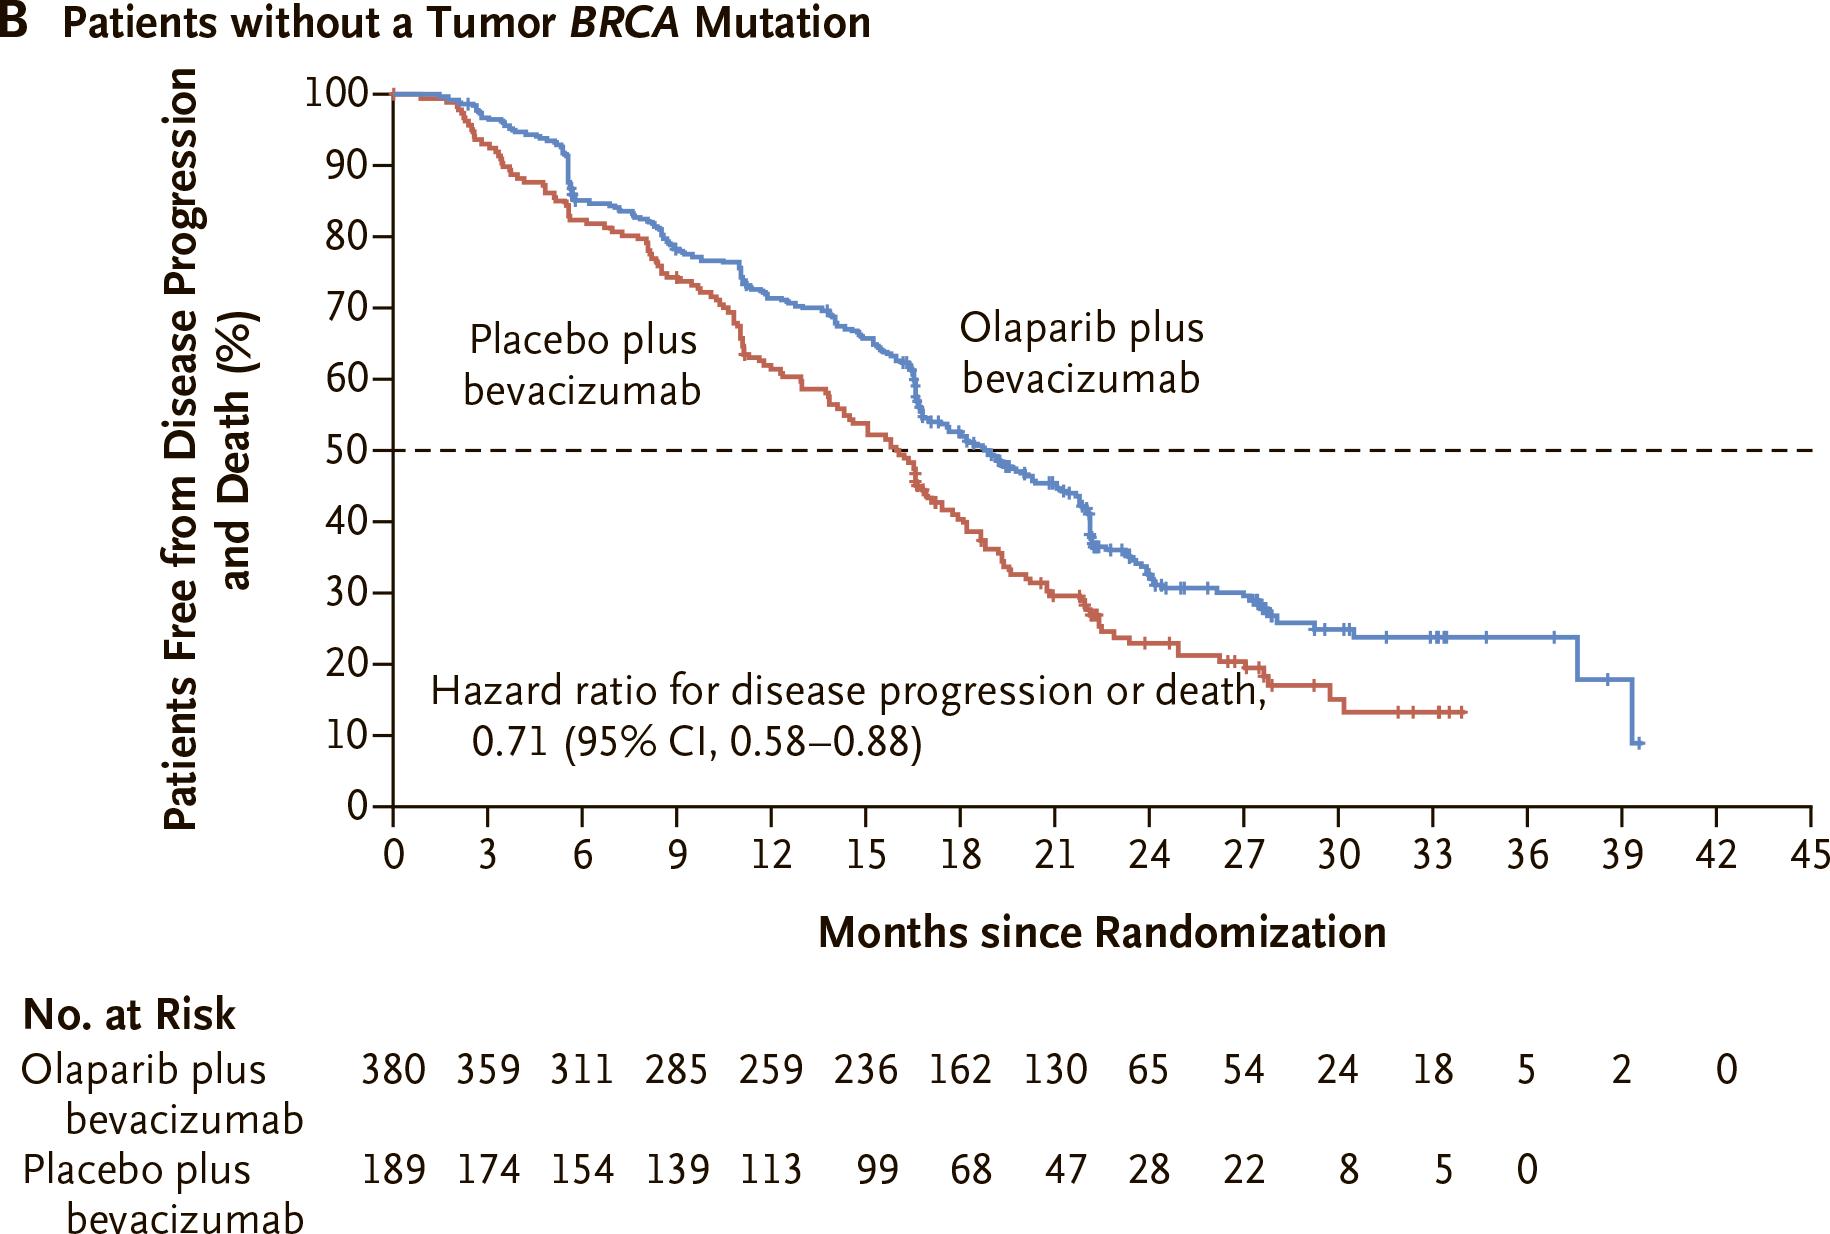 nct02477644 results 03 - «Линпарза» плюс «Авастин»: поддерживающая терапия рака яичников